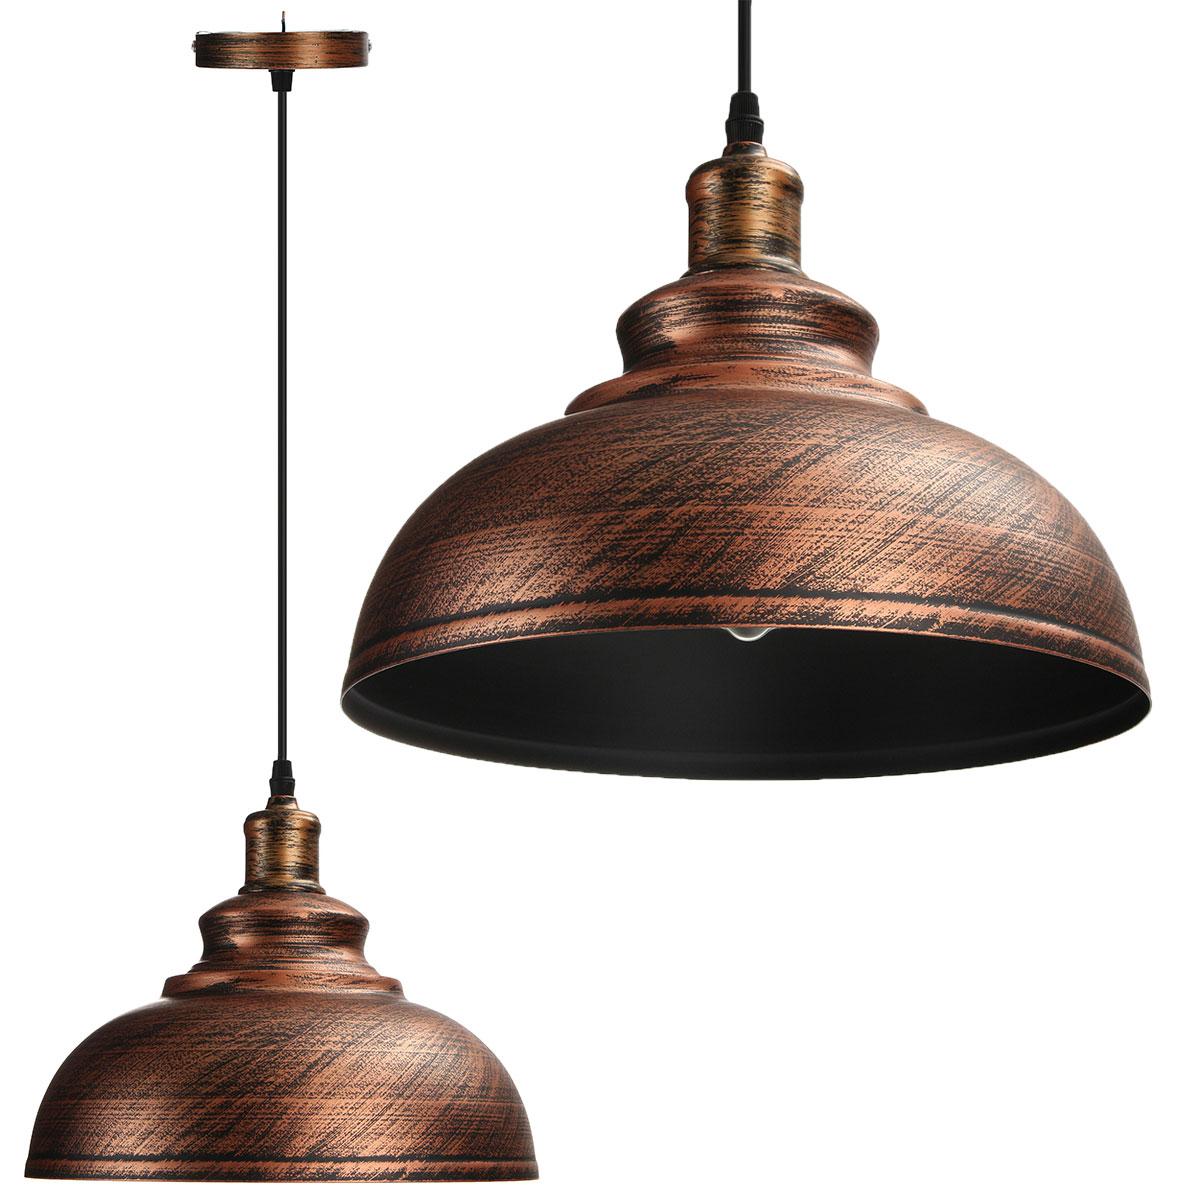 e27 r tro industriel plafonnier plafond lustre lampe lumi re suspendu clairage ebay. Black Bedroom Furniture Sets. Home Design Ideas